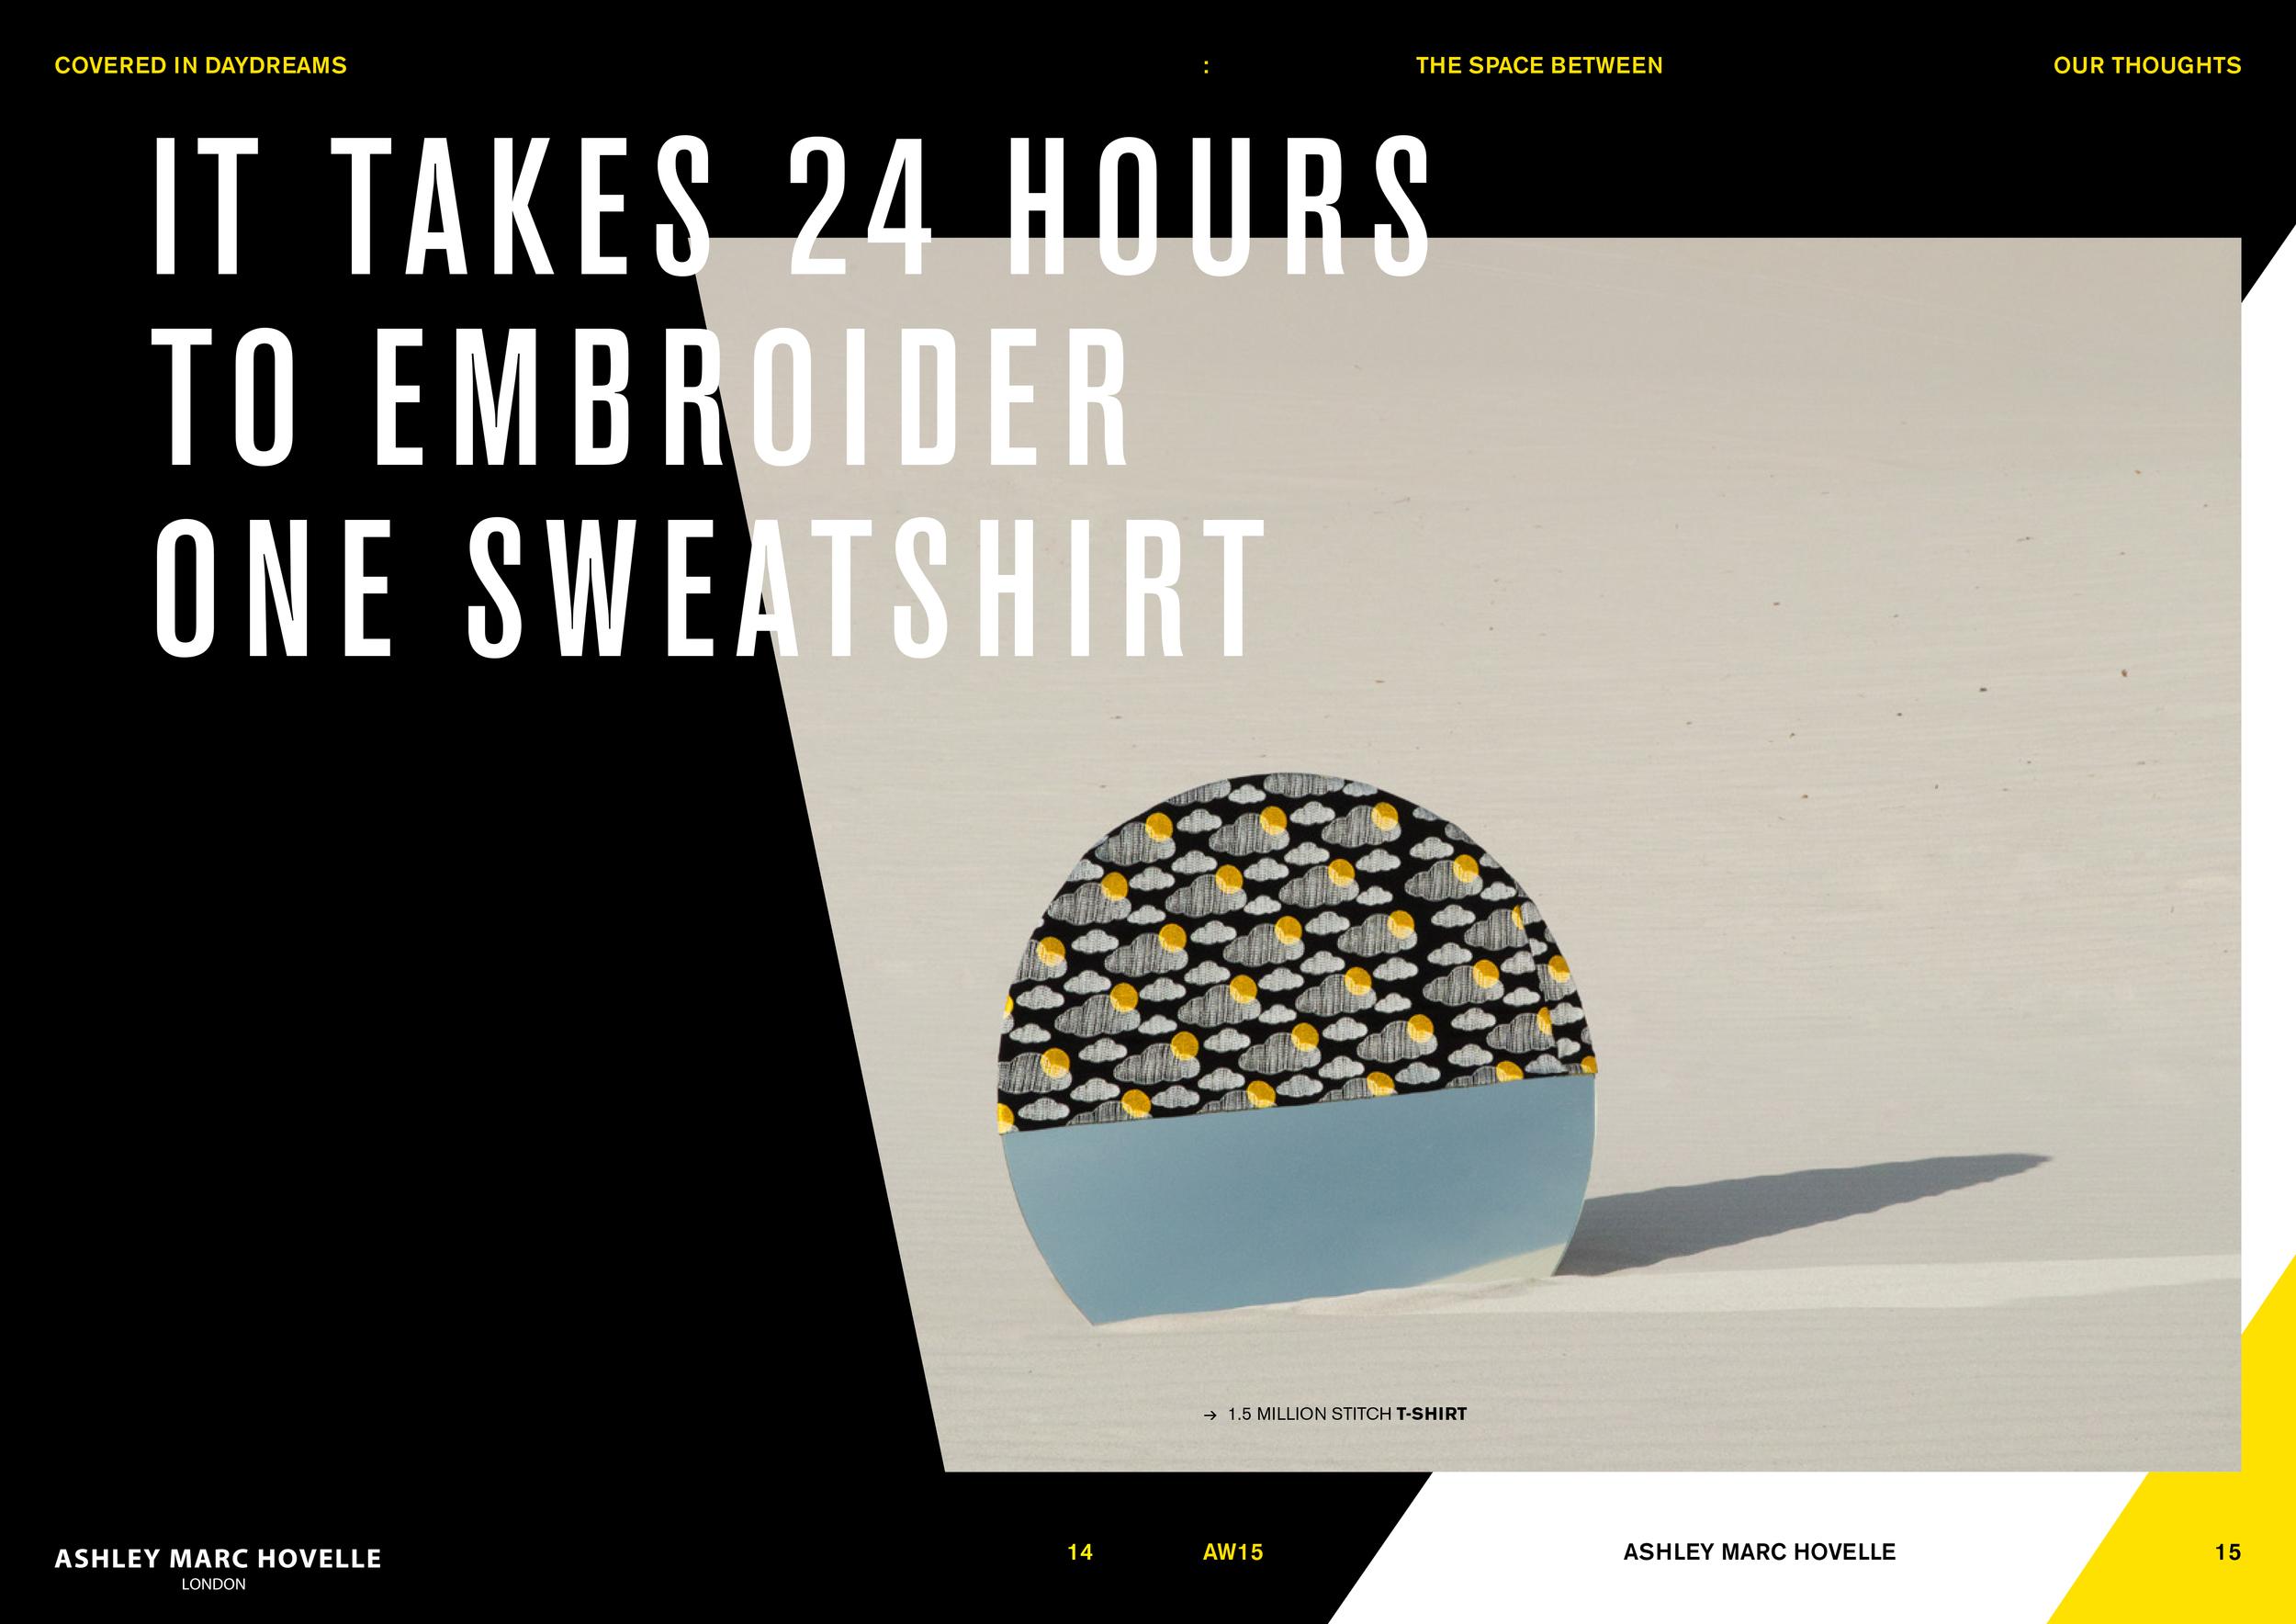 ashleymarchovelle-1.5millionstitchsweatshirt-24hourstoembroider